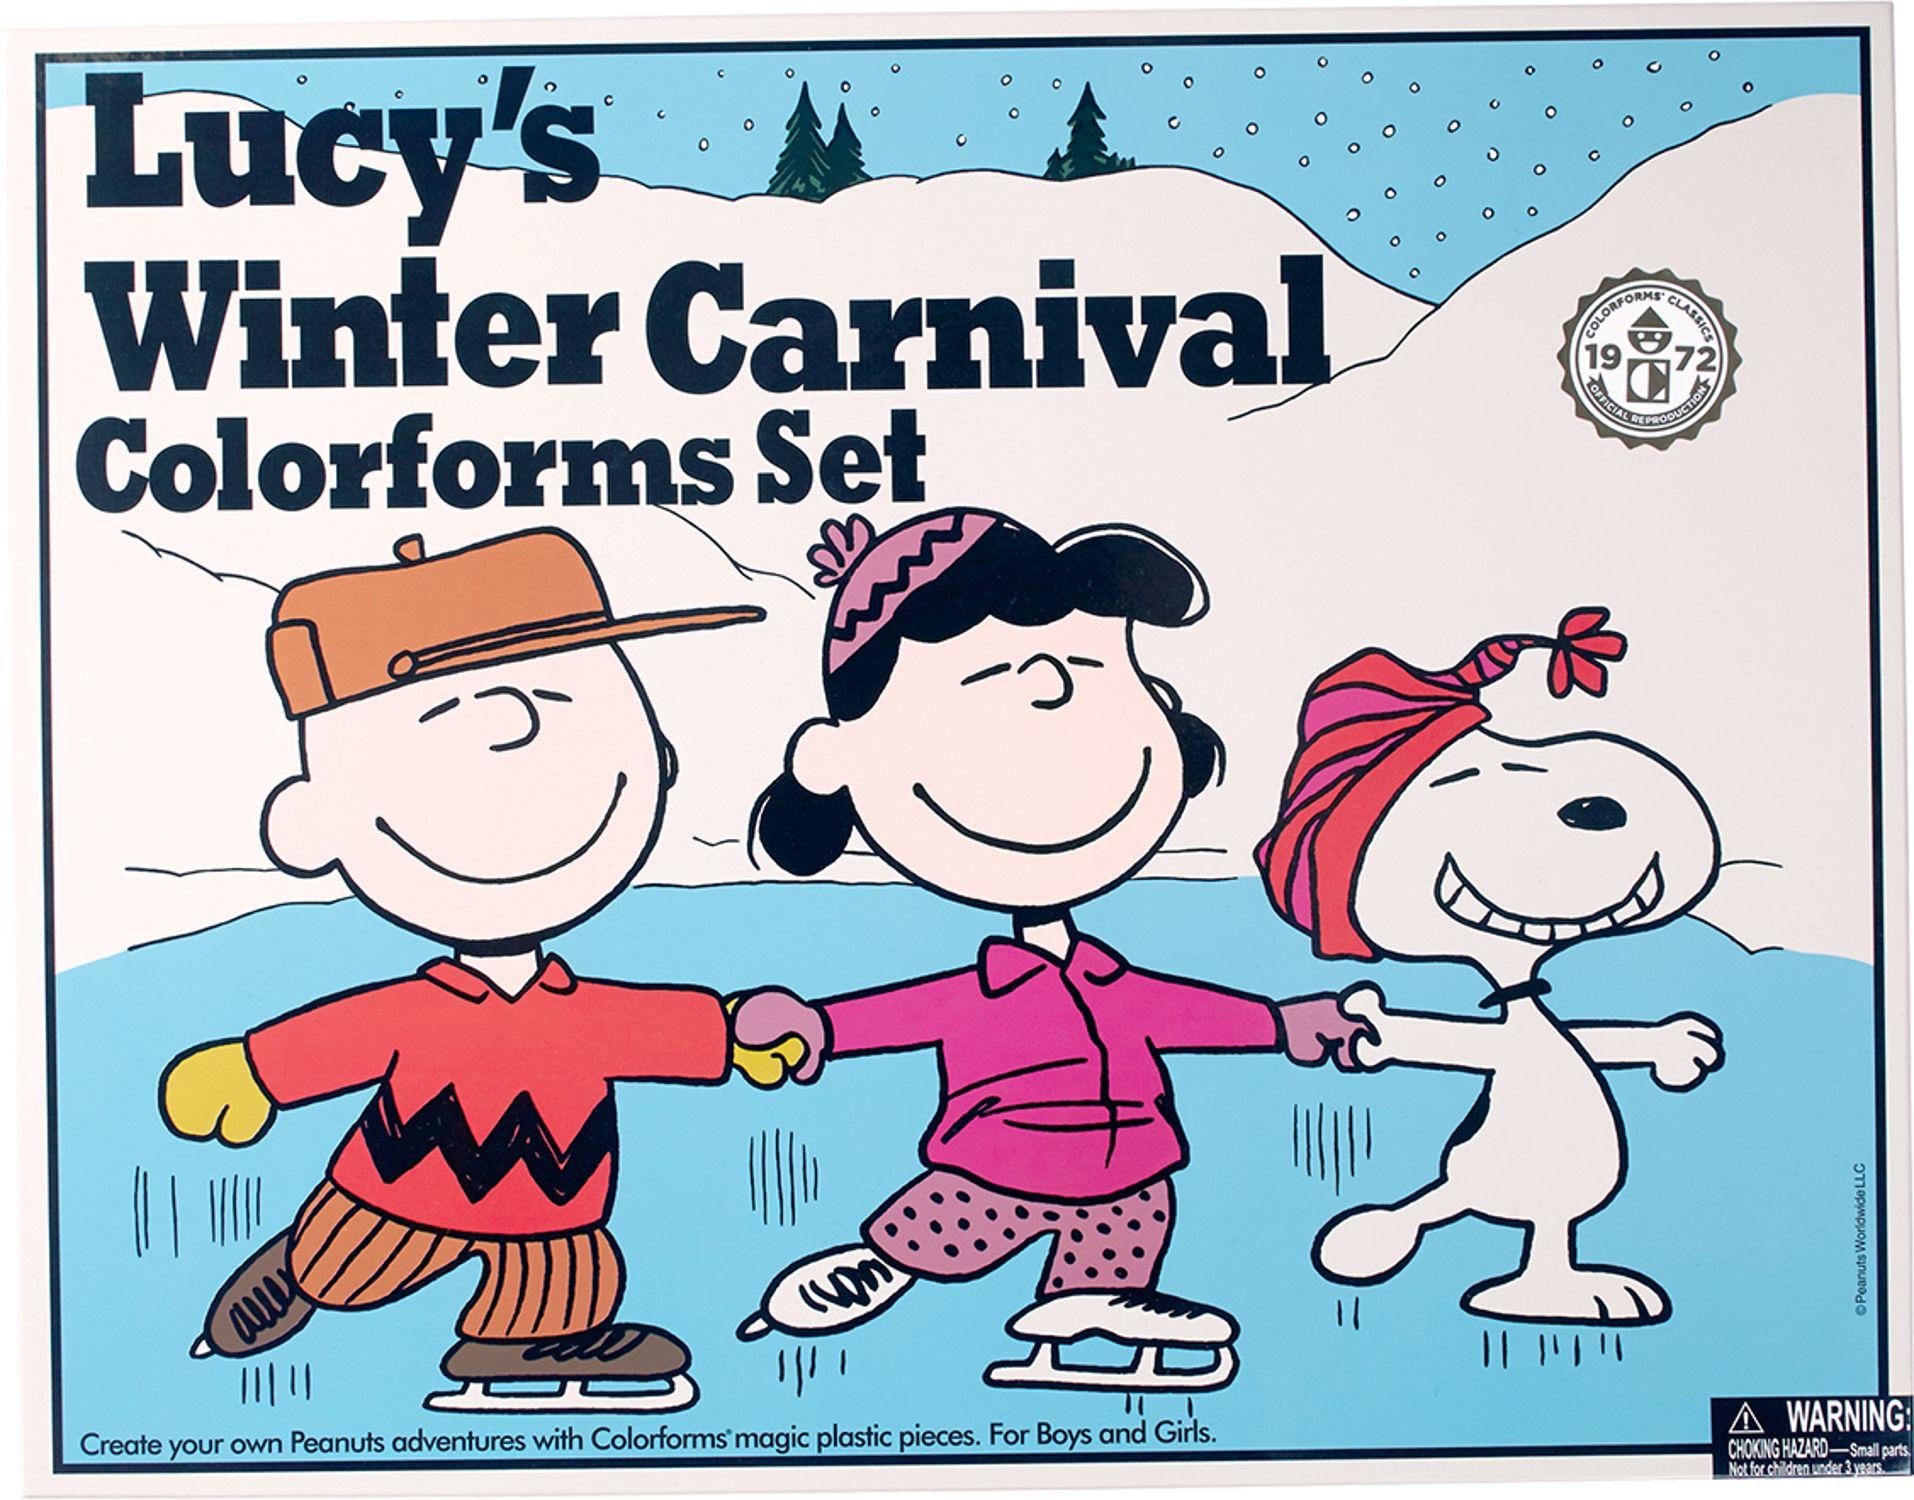 e8c6b249f228f9 Peanuts Colorform Set for Lucys Winter Carnival